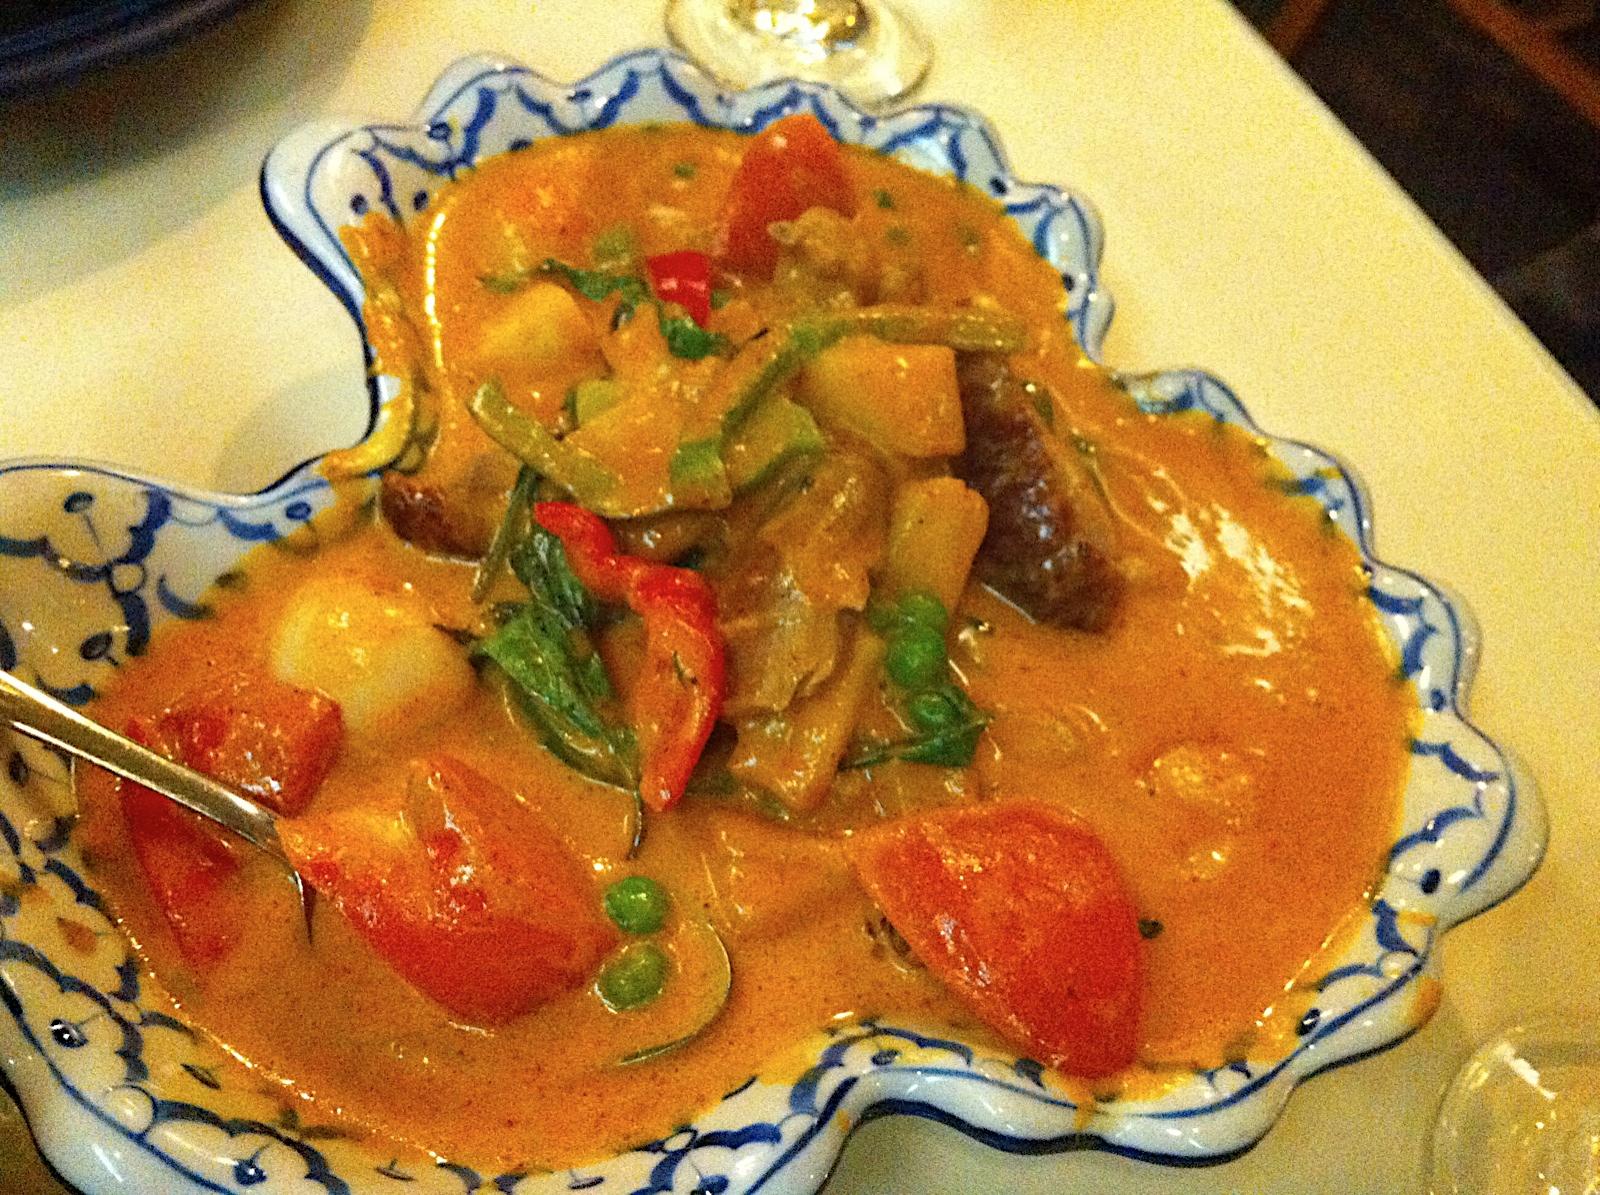 Voyagers amarin thai cuisine mountain view ca for Amarin thai cuisine mountain view ca